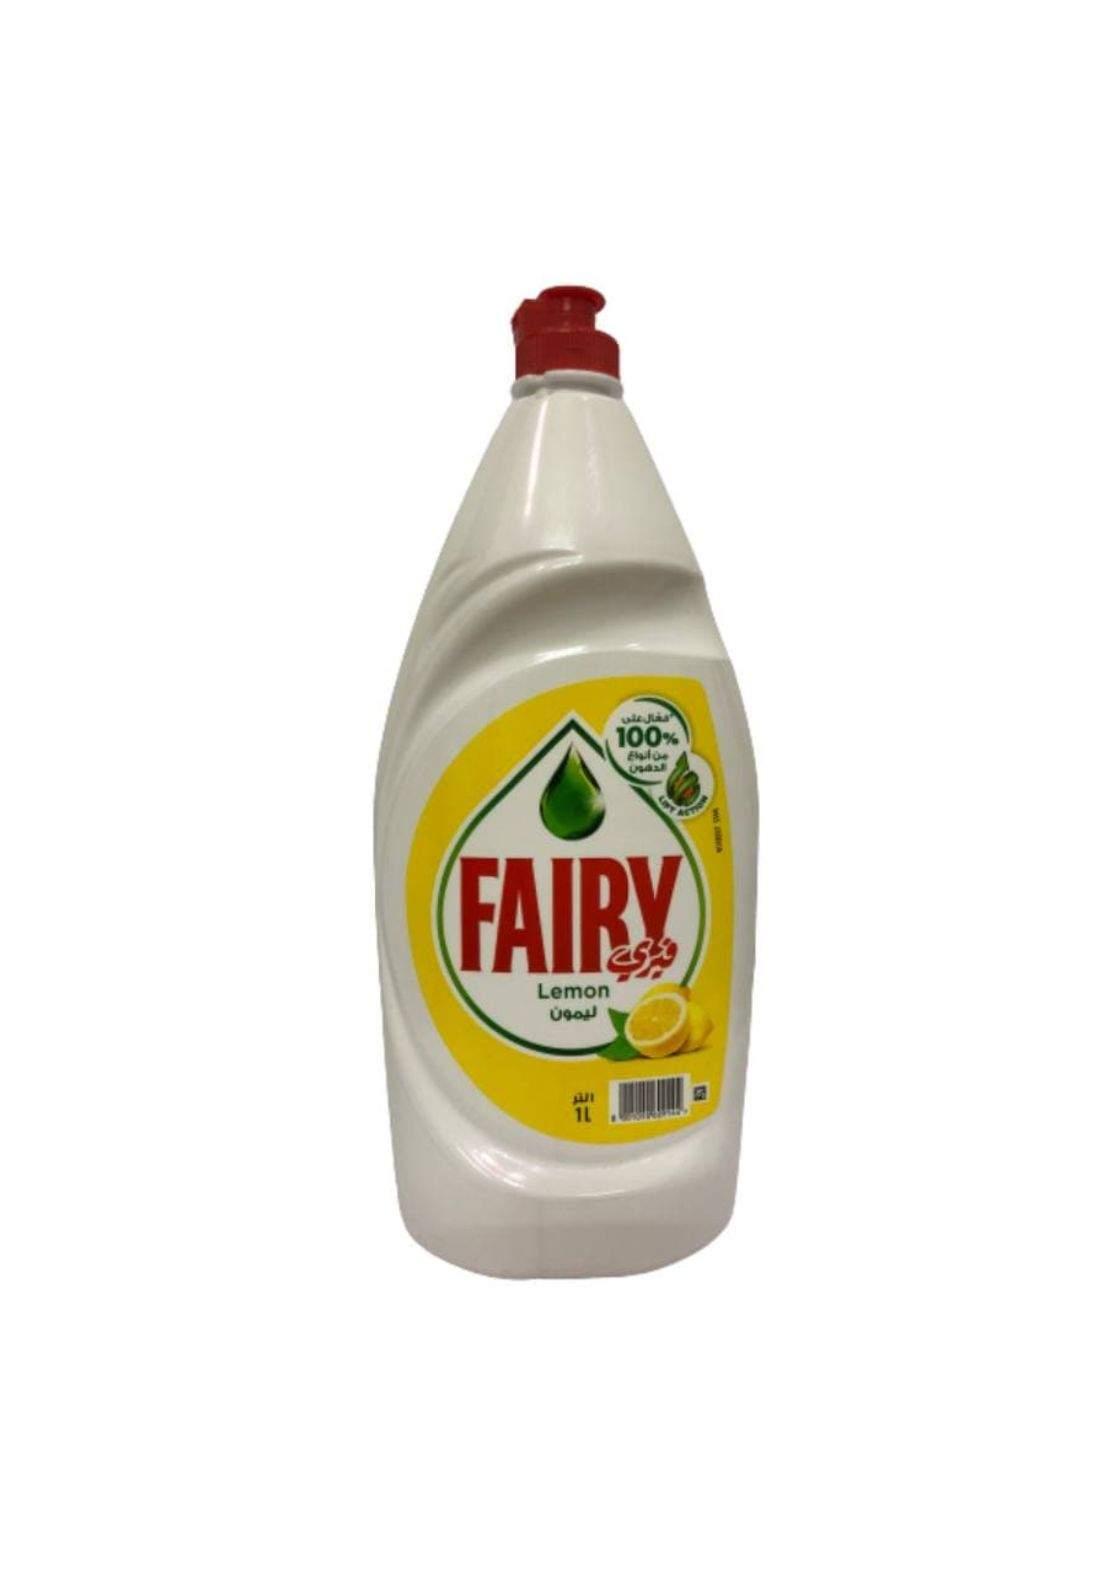 Fairy Dishwashing liquid1L فيري سائل لتنظيف الاواني